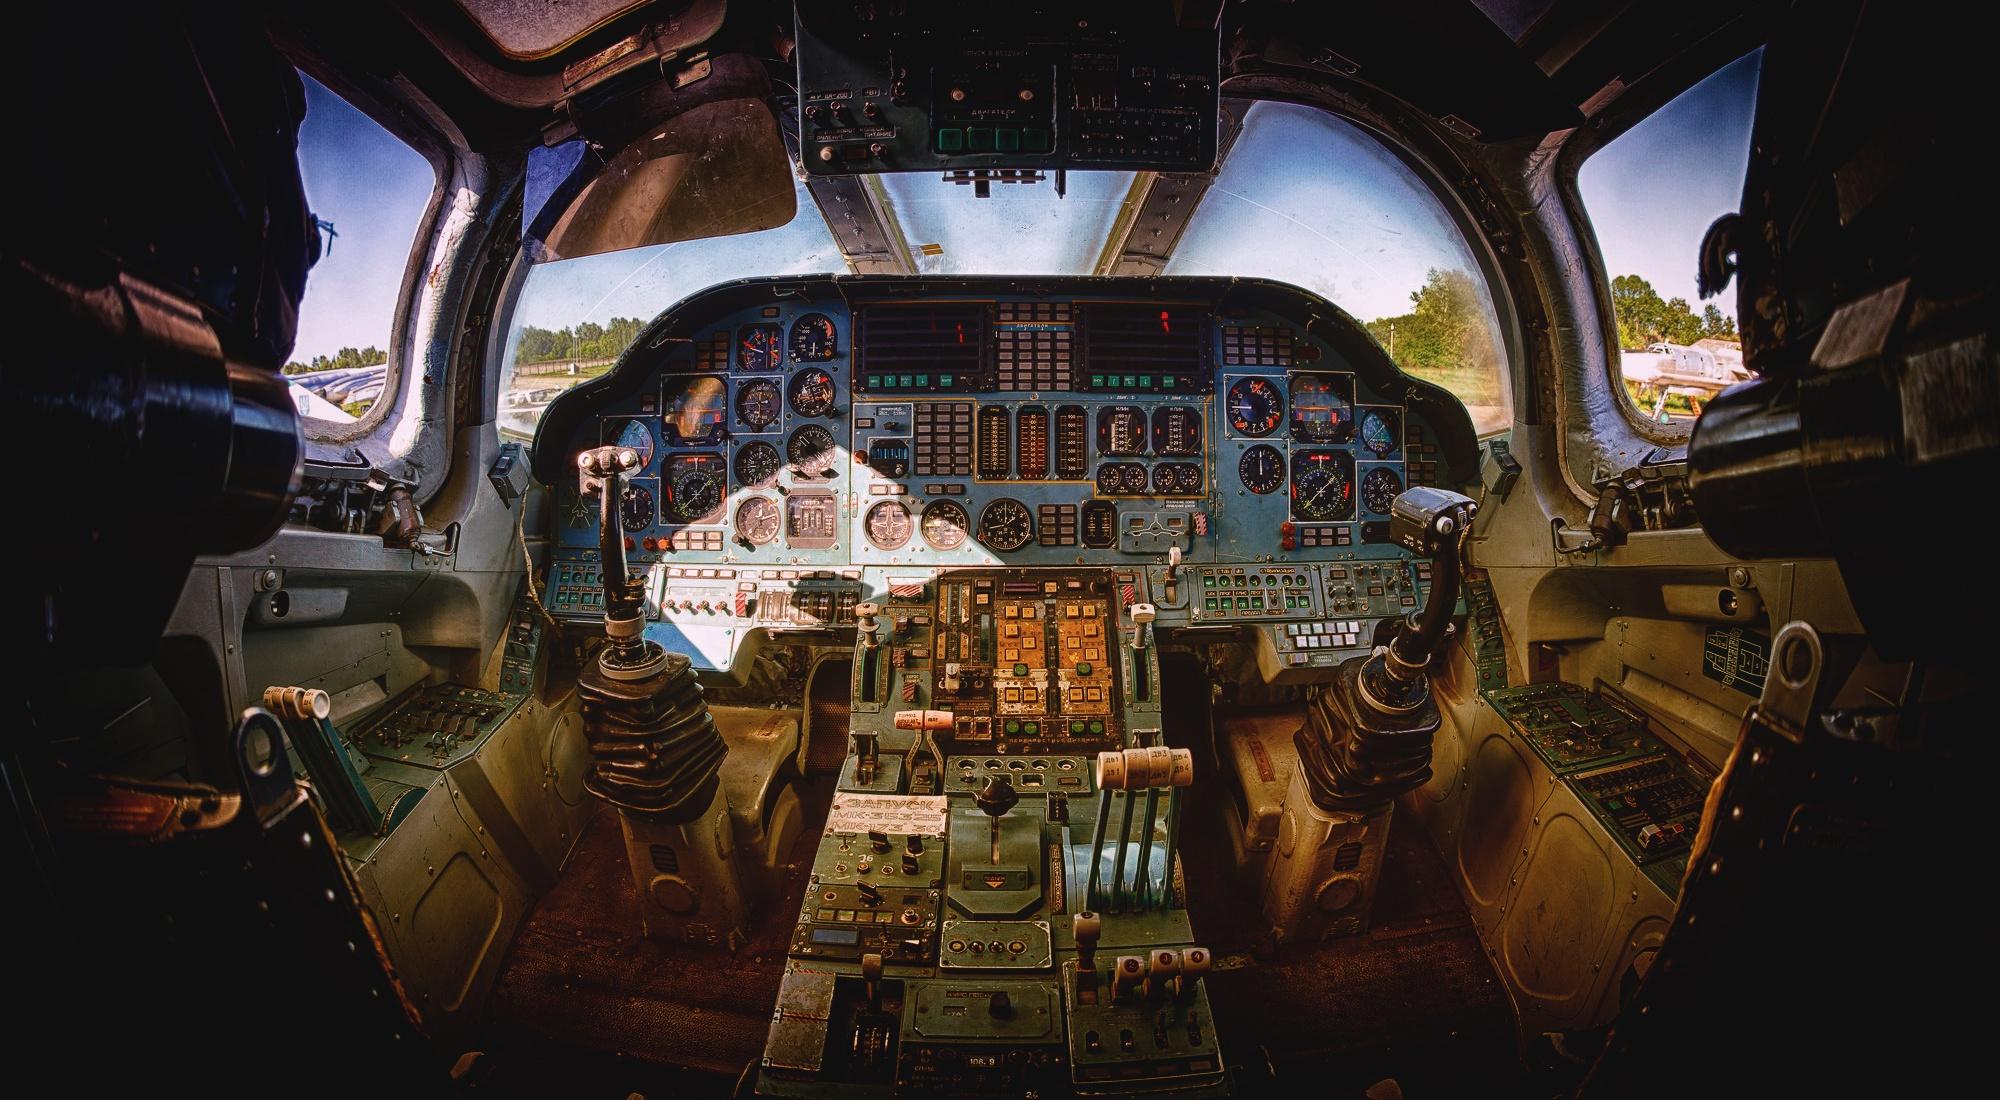 General 2000x1100 cockpit aircraft vehicle Tupolev Tu-22M3 Russian Air Force